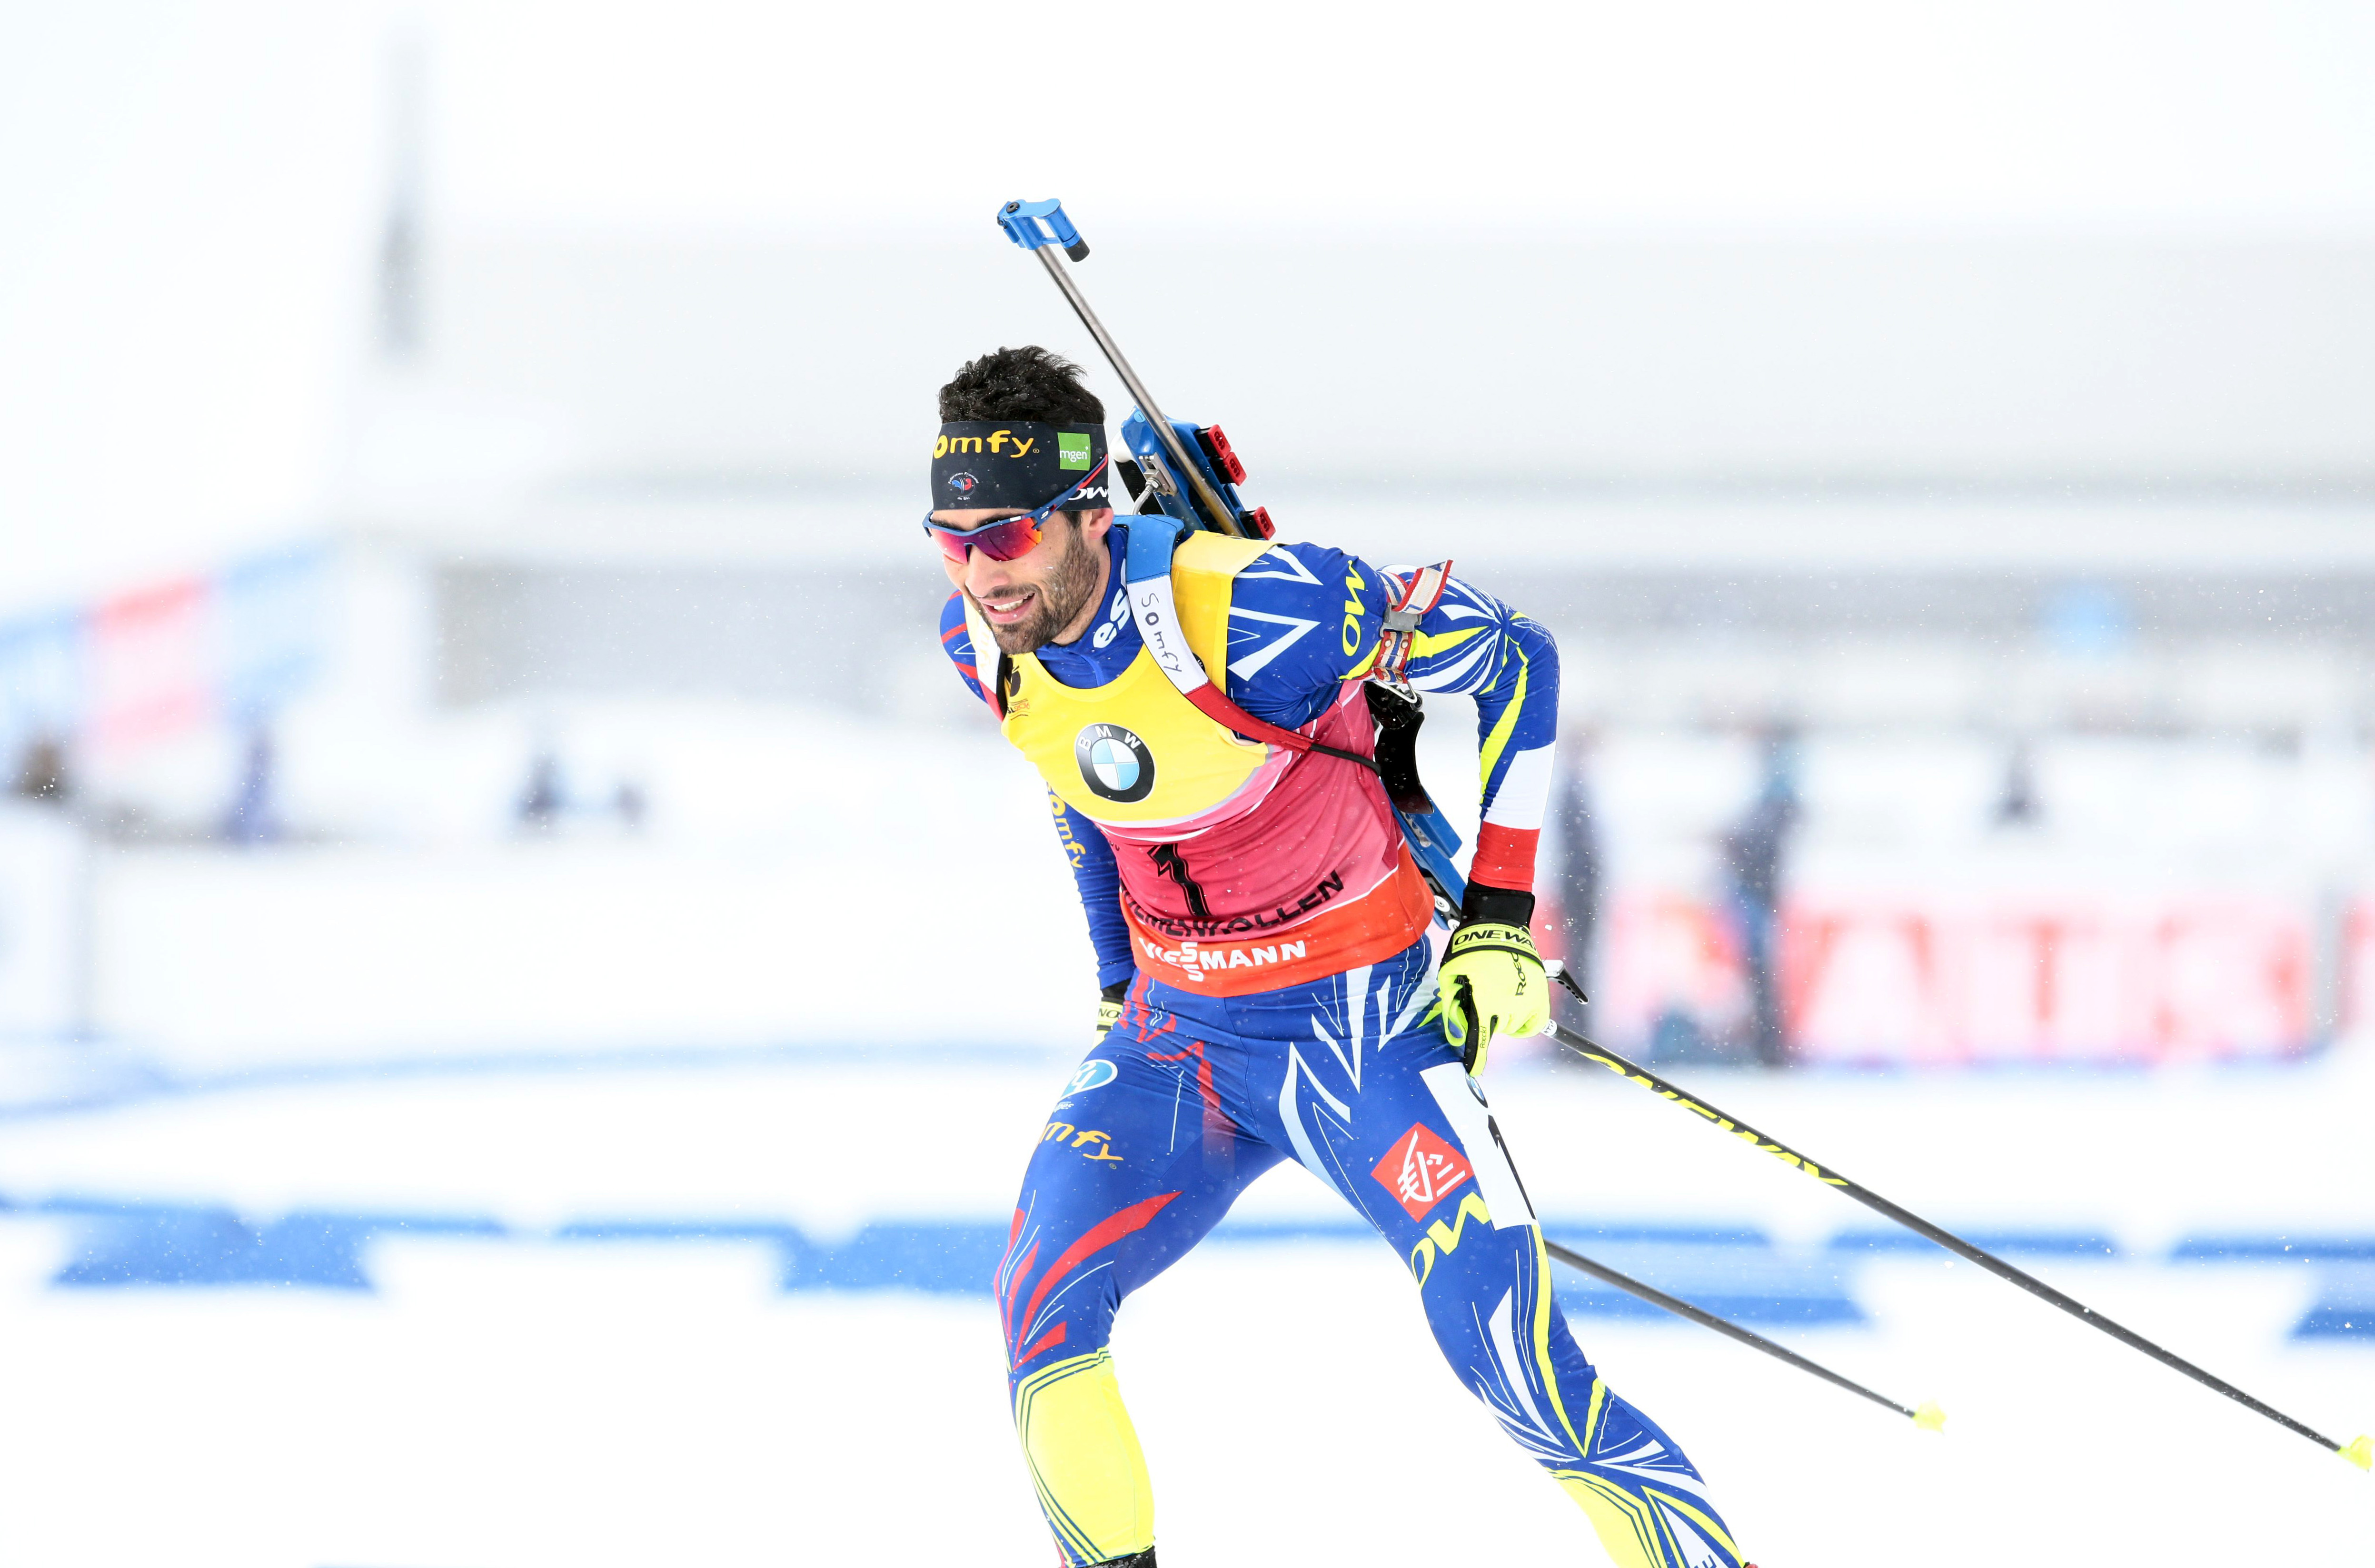 norway_biathlon_world_championships-b291_r9787.jpeg